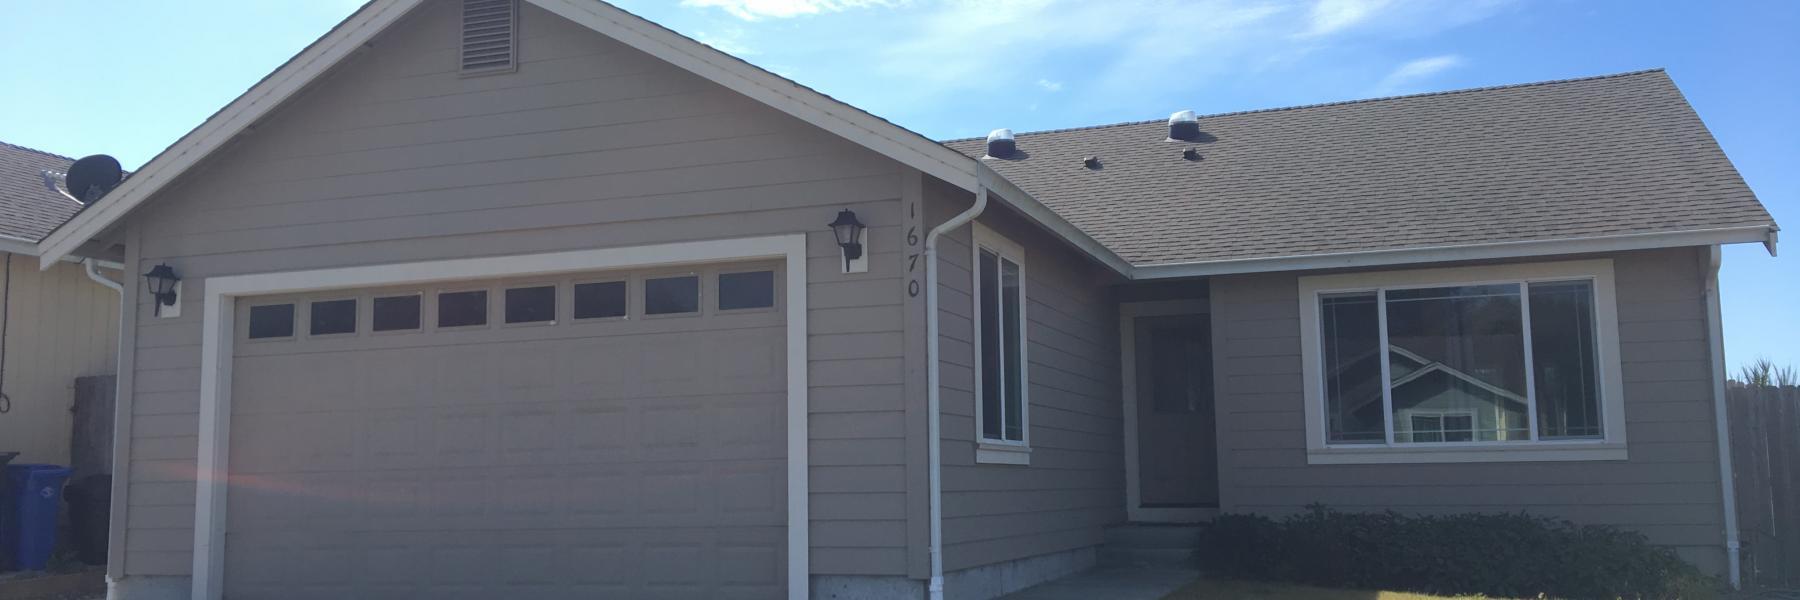 1670 Oakdale McKinleyville Home for Rent